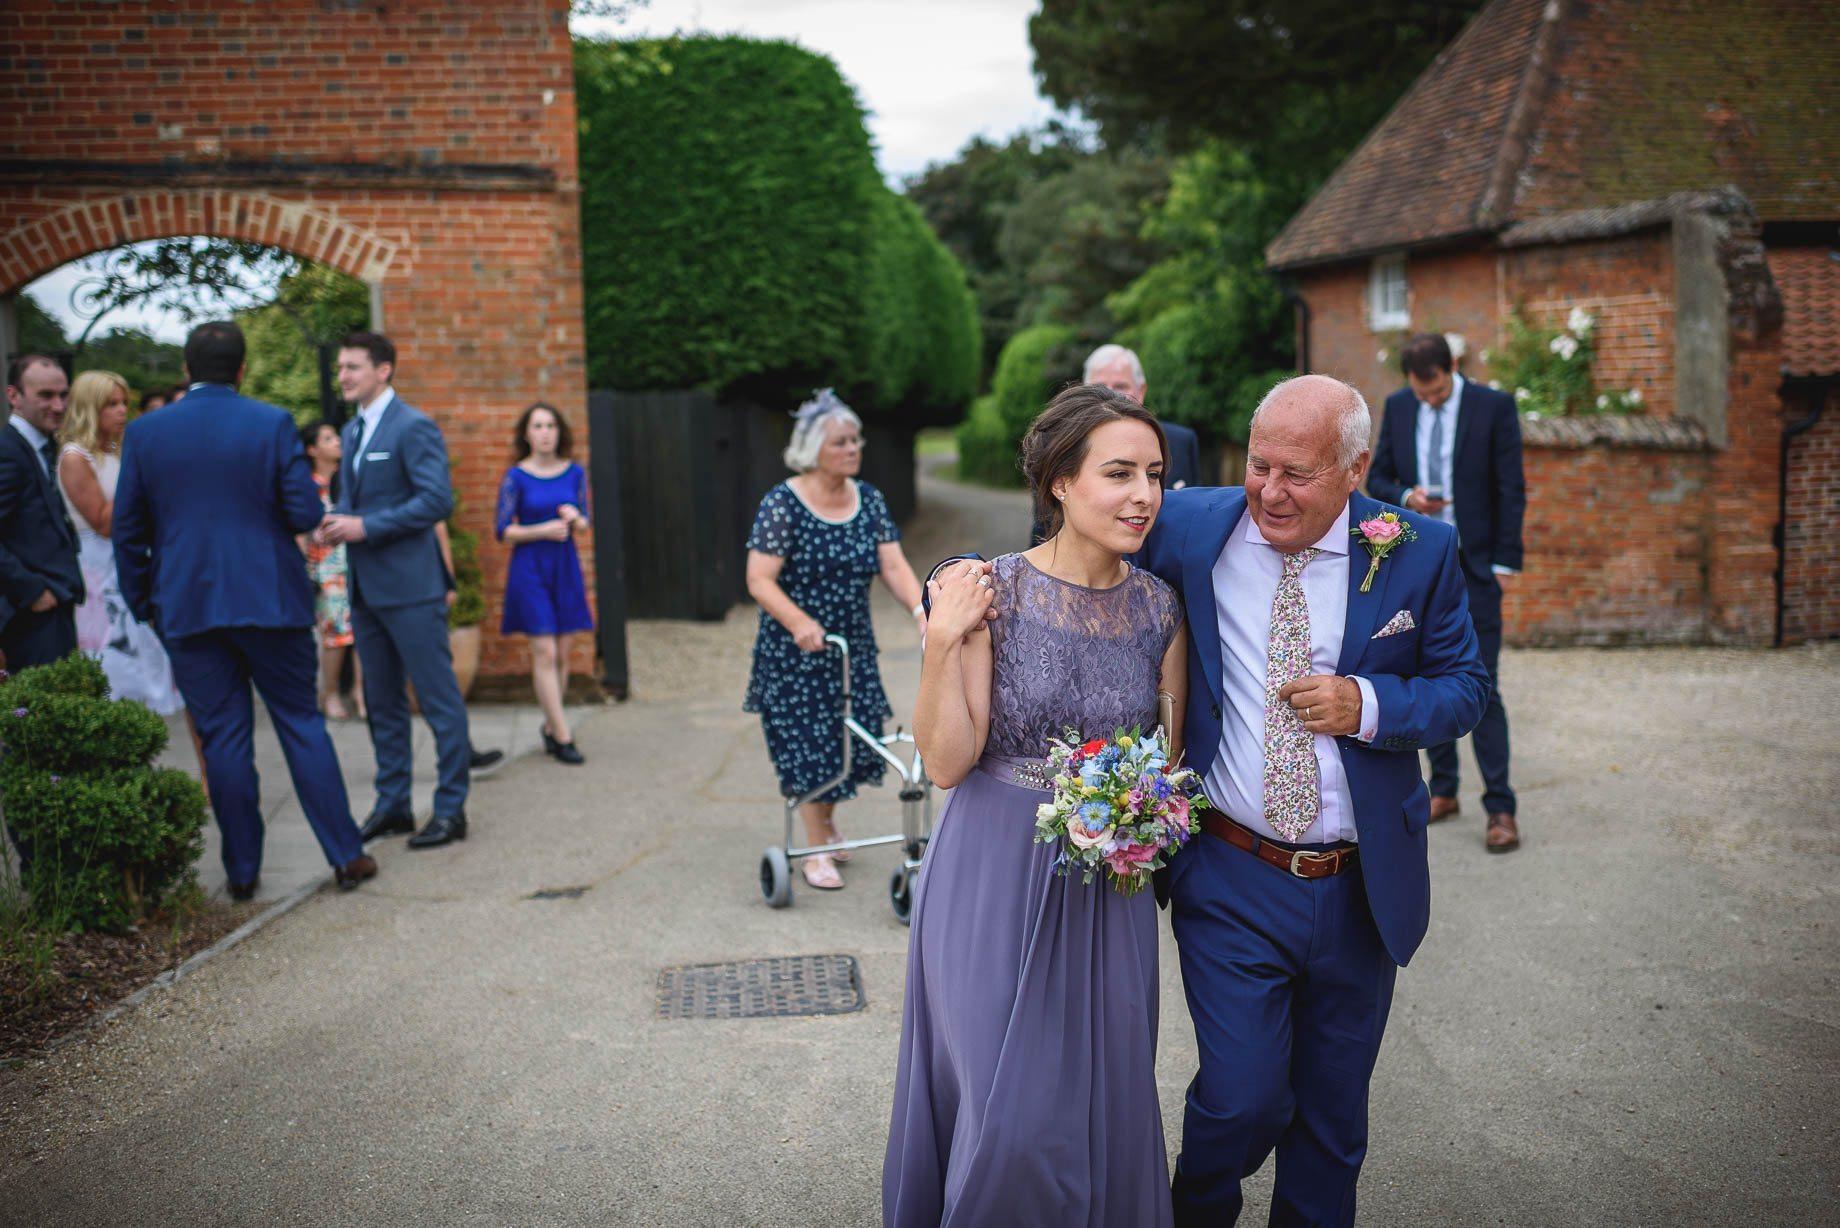 Gaynes Park wedding photography - Guy Collier Photography - Rachel and Jon (105 of 169)